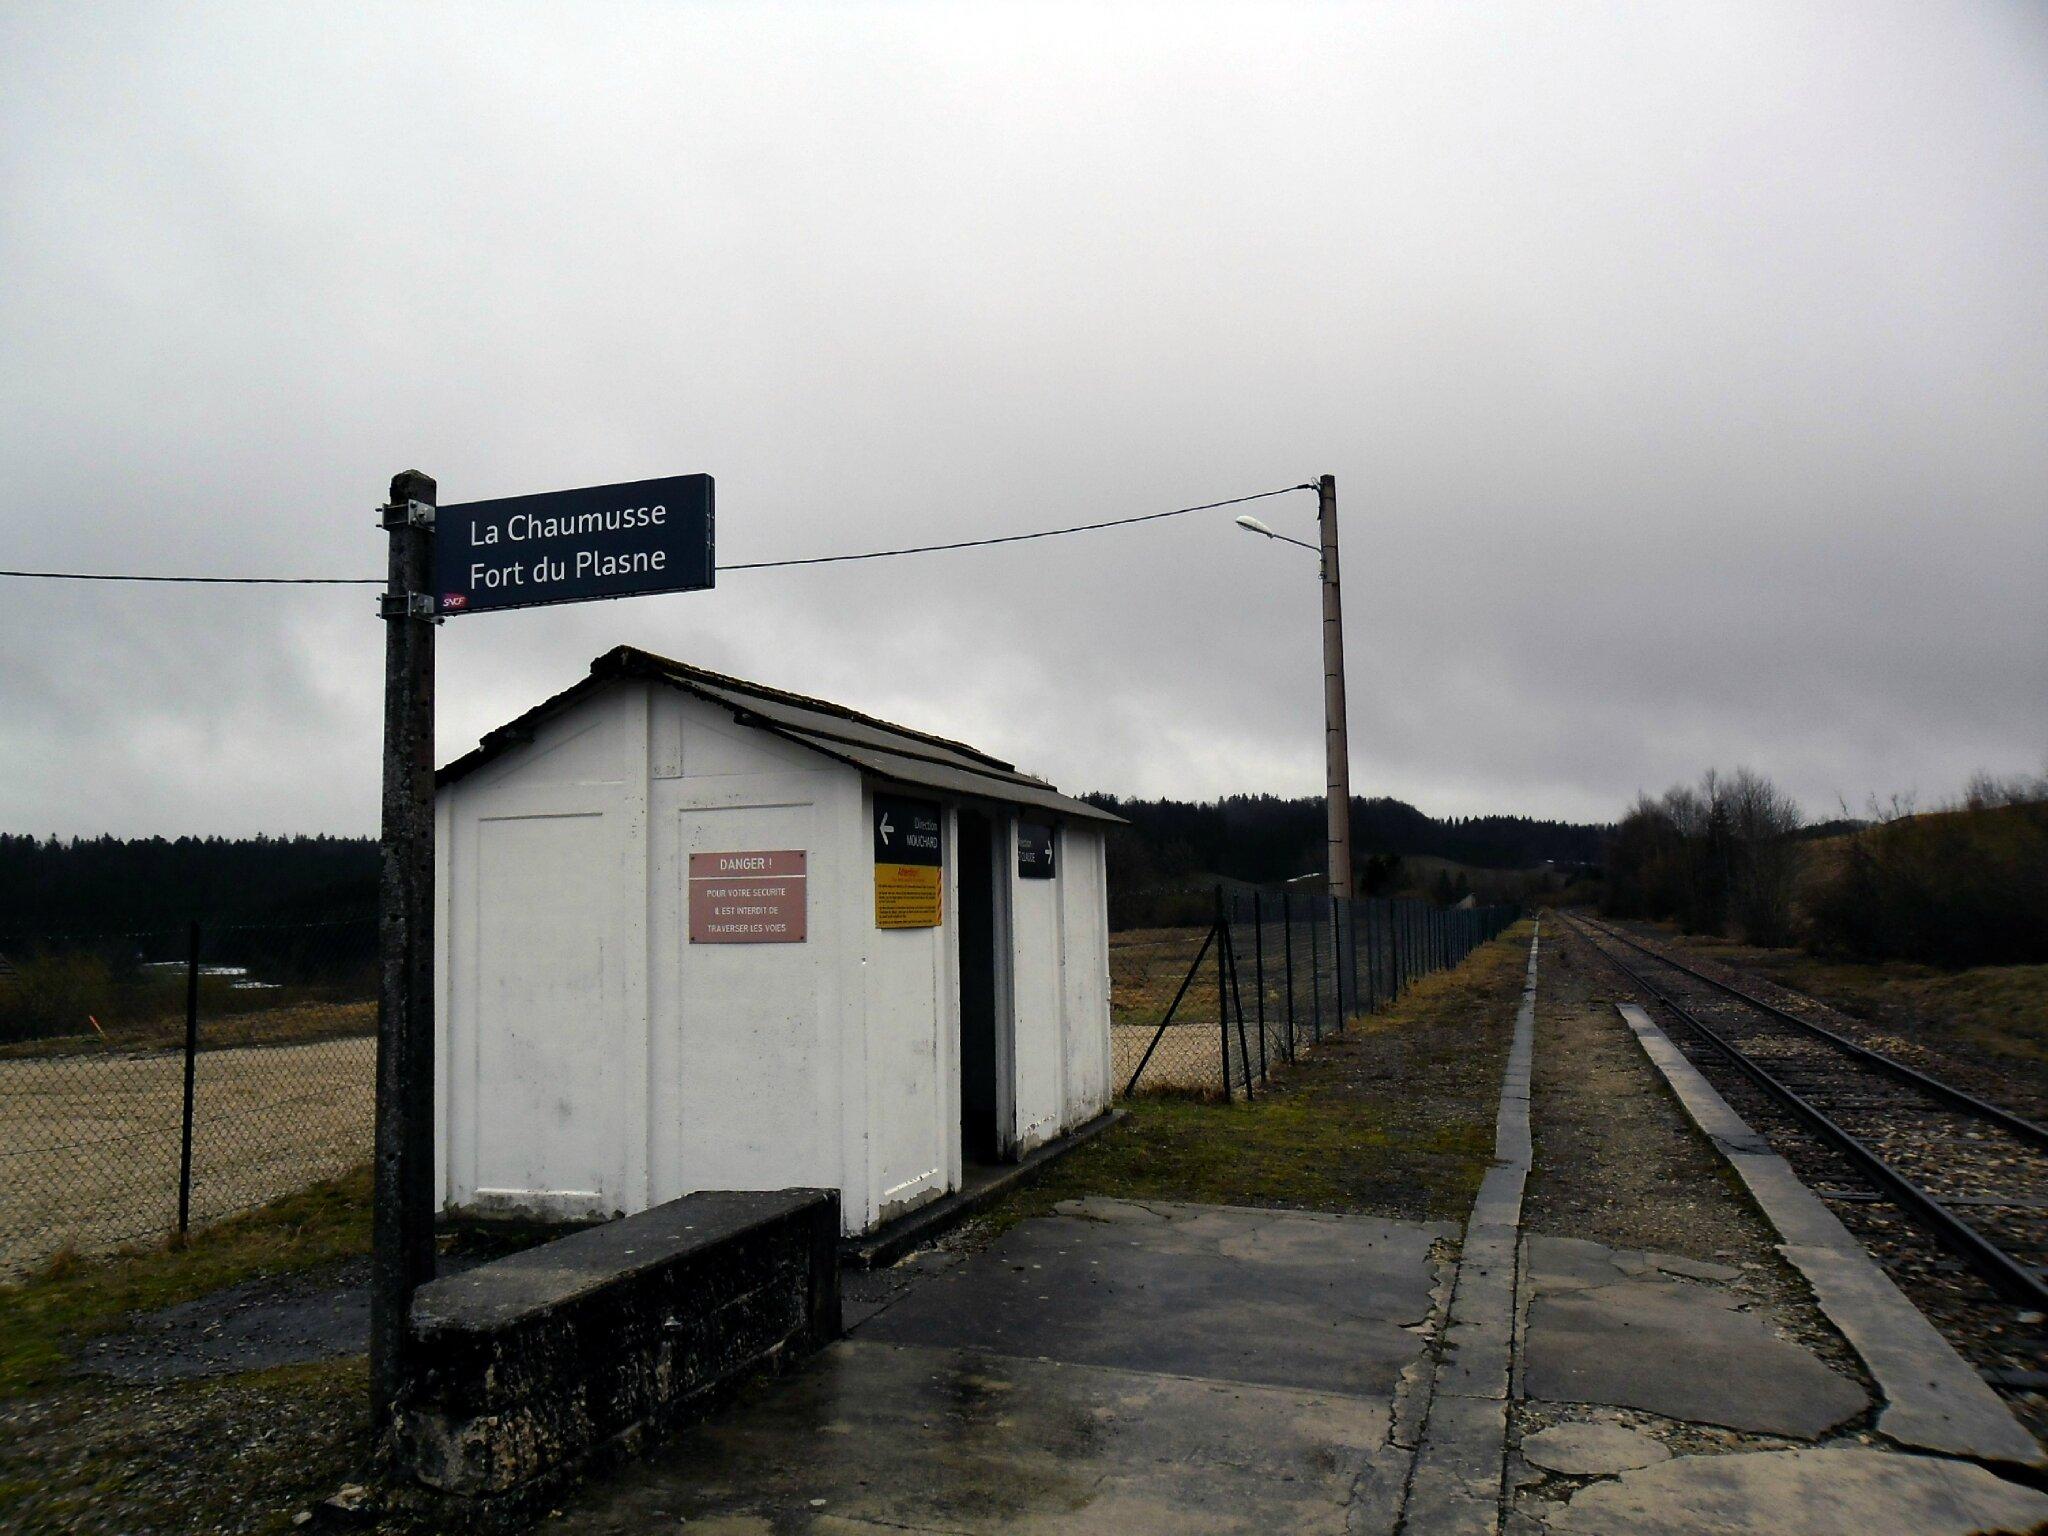 La Chaumusse - Fort du Plasne (Jura)